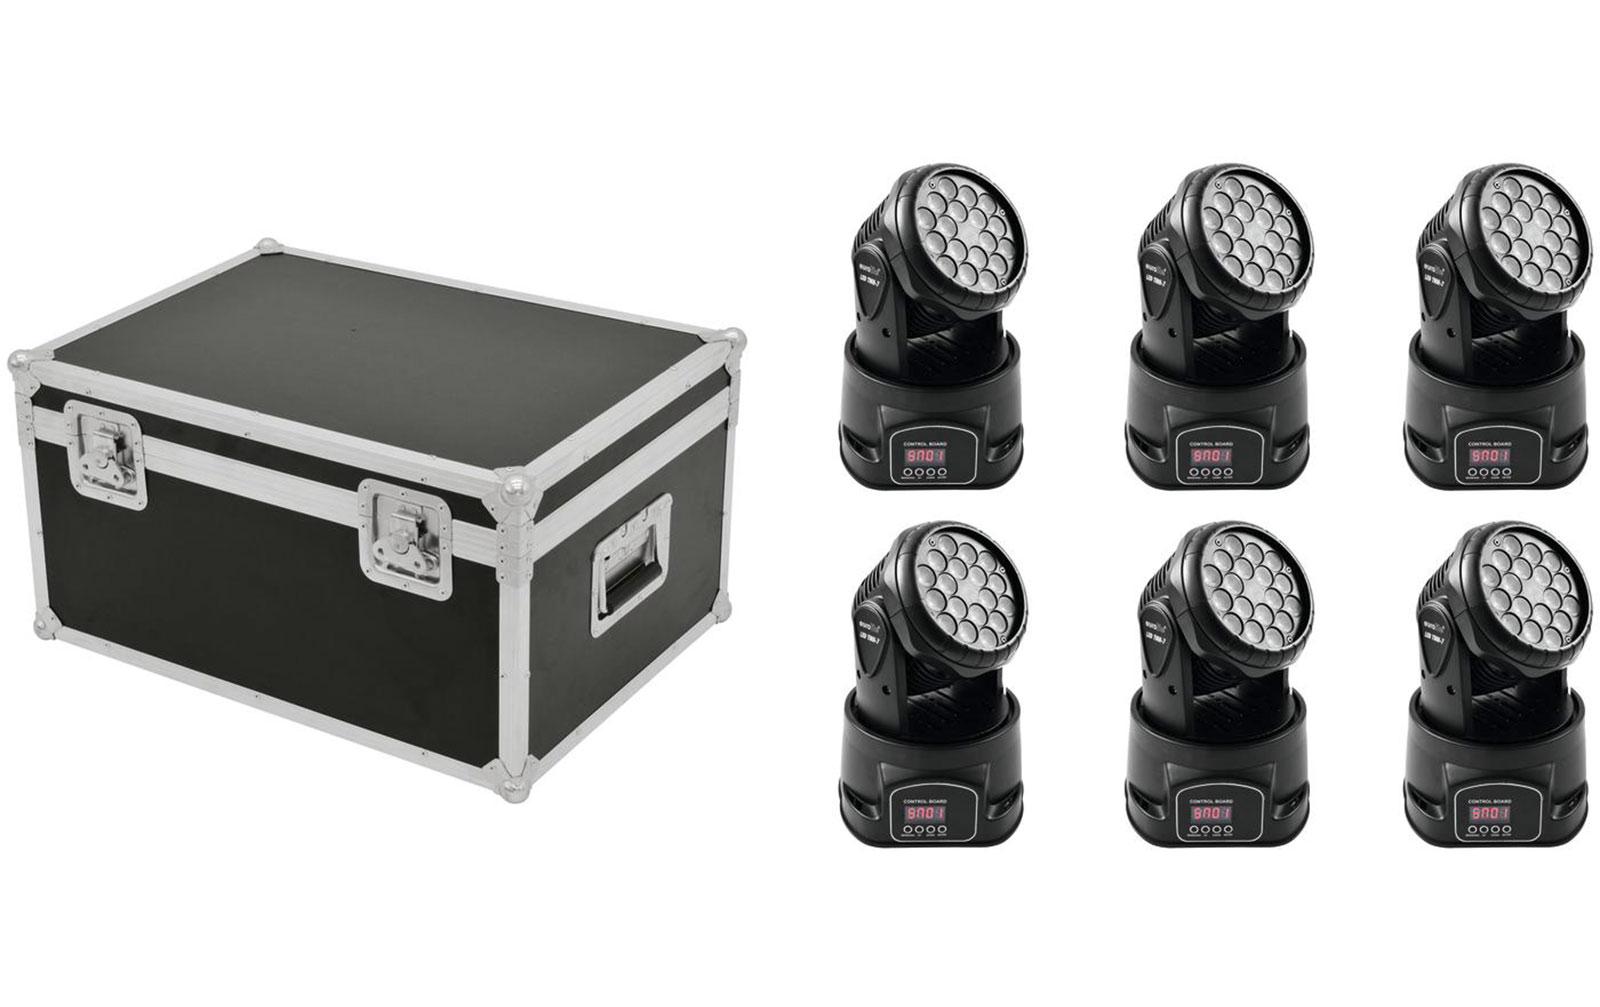 eurolite-set-6x-led-tmh-7-case